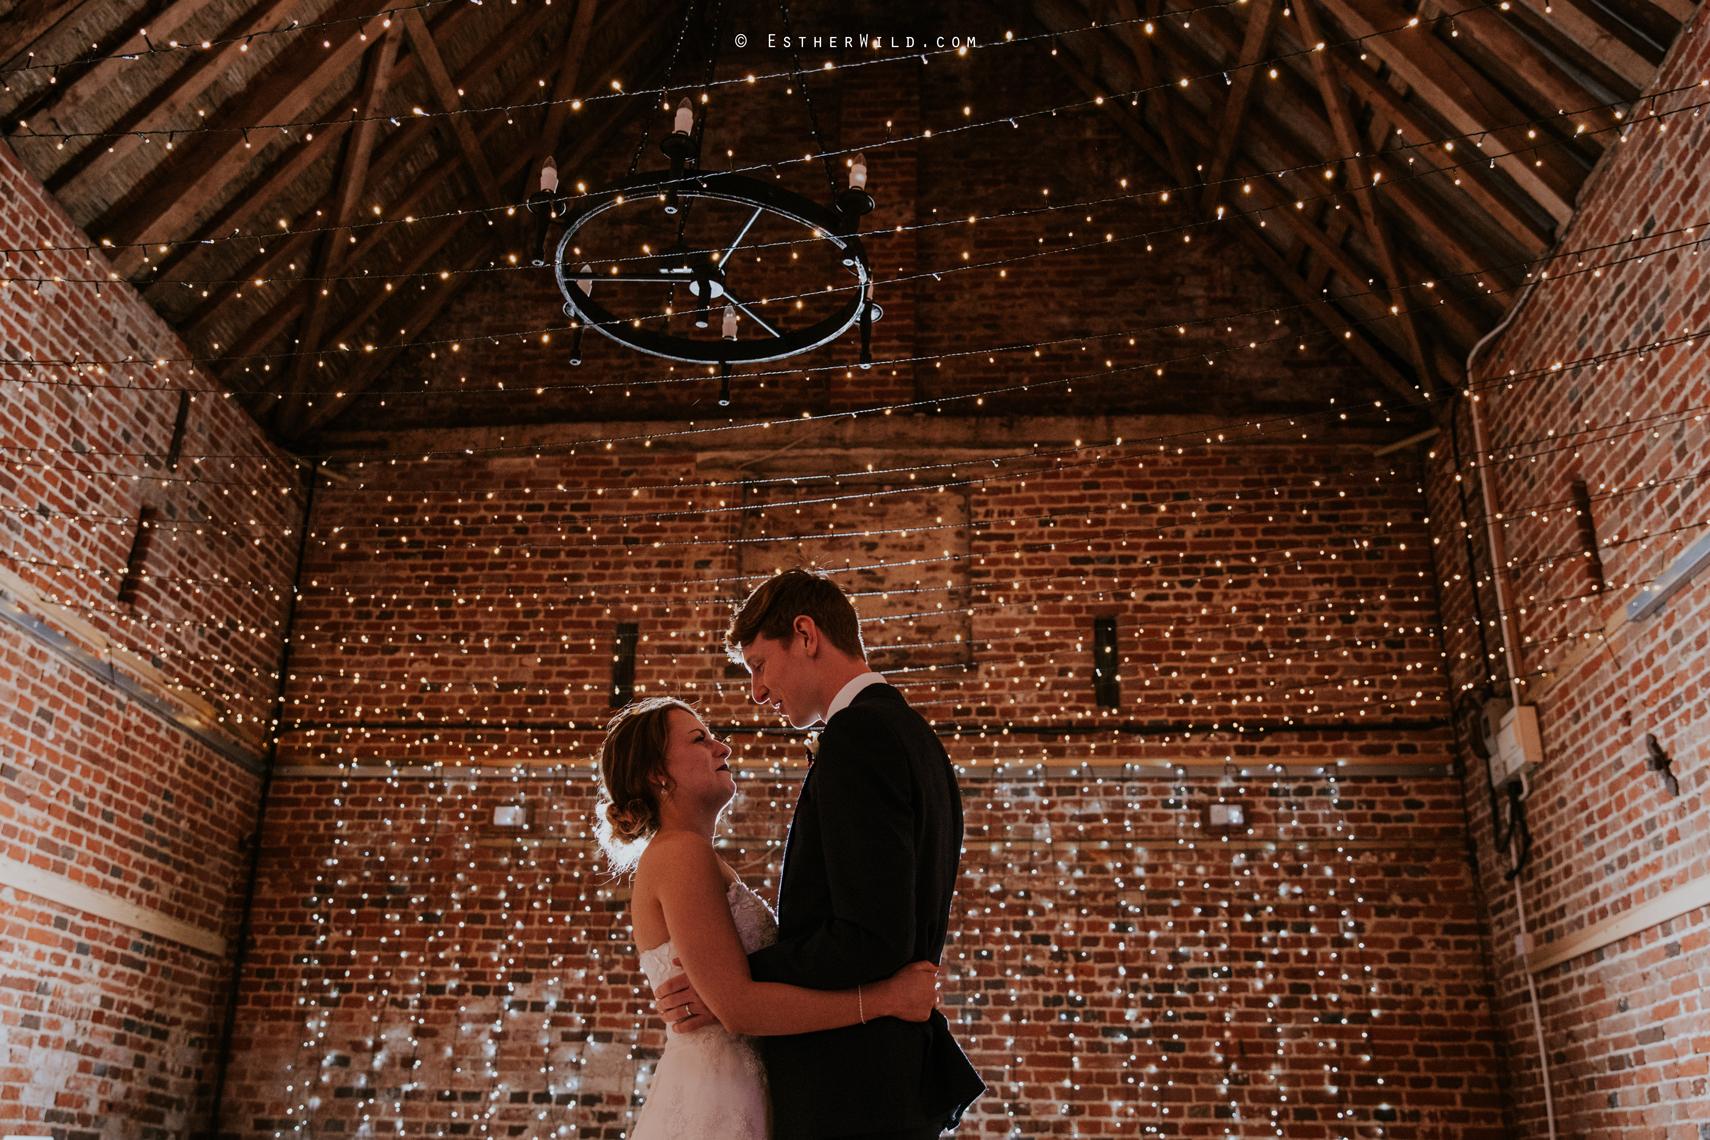 Glebe_Farm_Barn_Rustic_Norfolk_Wedding_Esther_Wild_Photographer_Copyright_IMG_2838.jpg